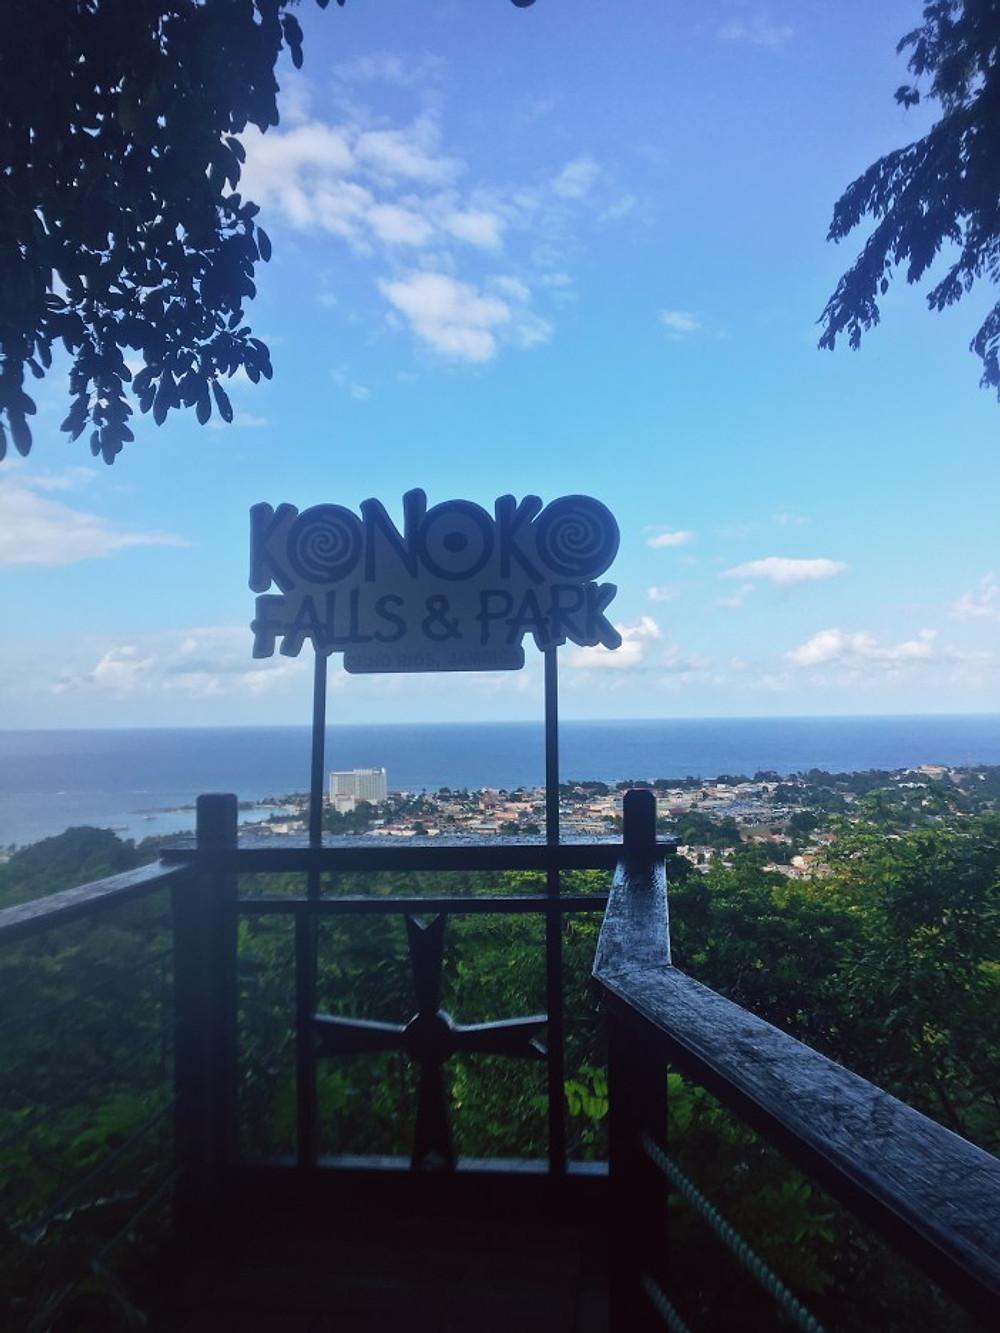 konoko falls jamaica Ocho Rios